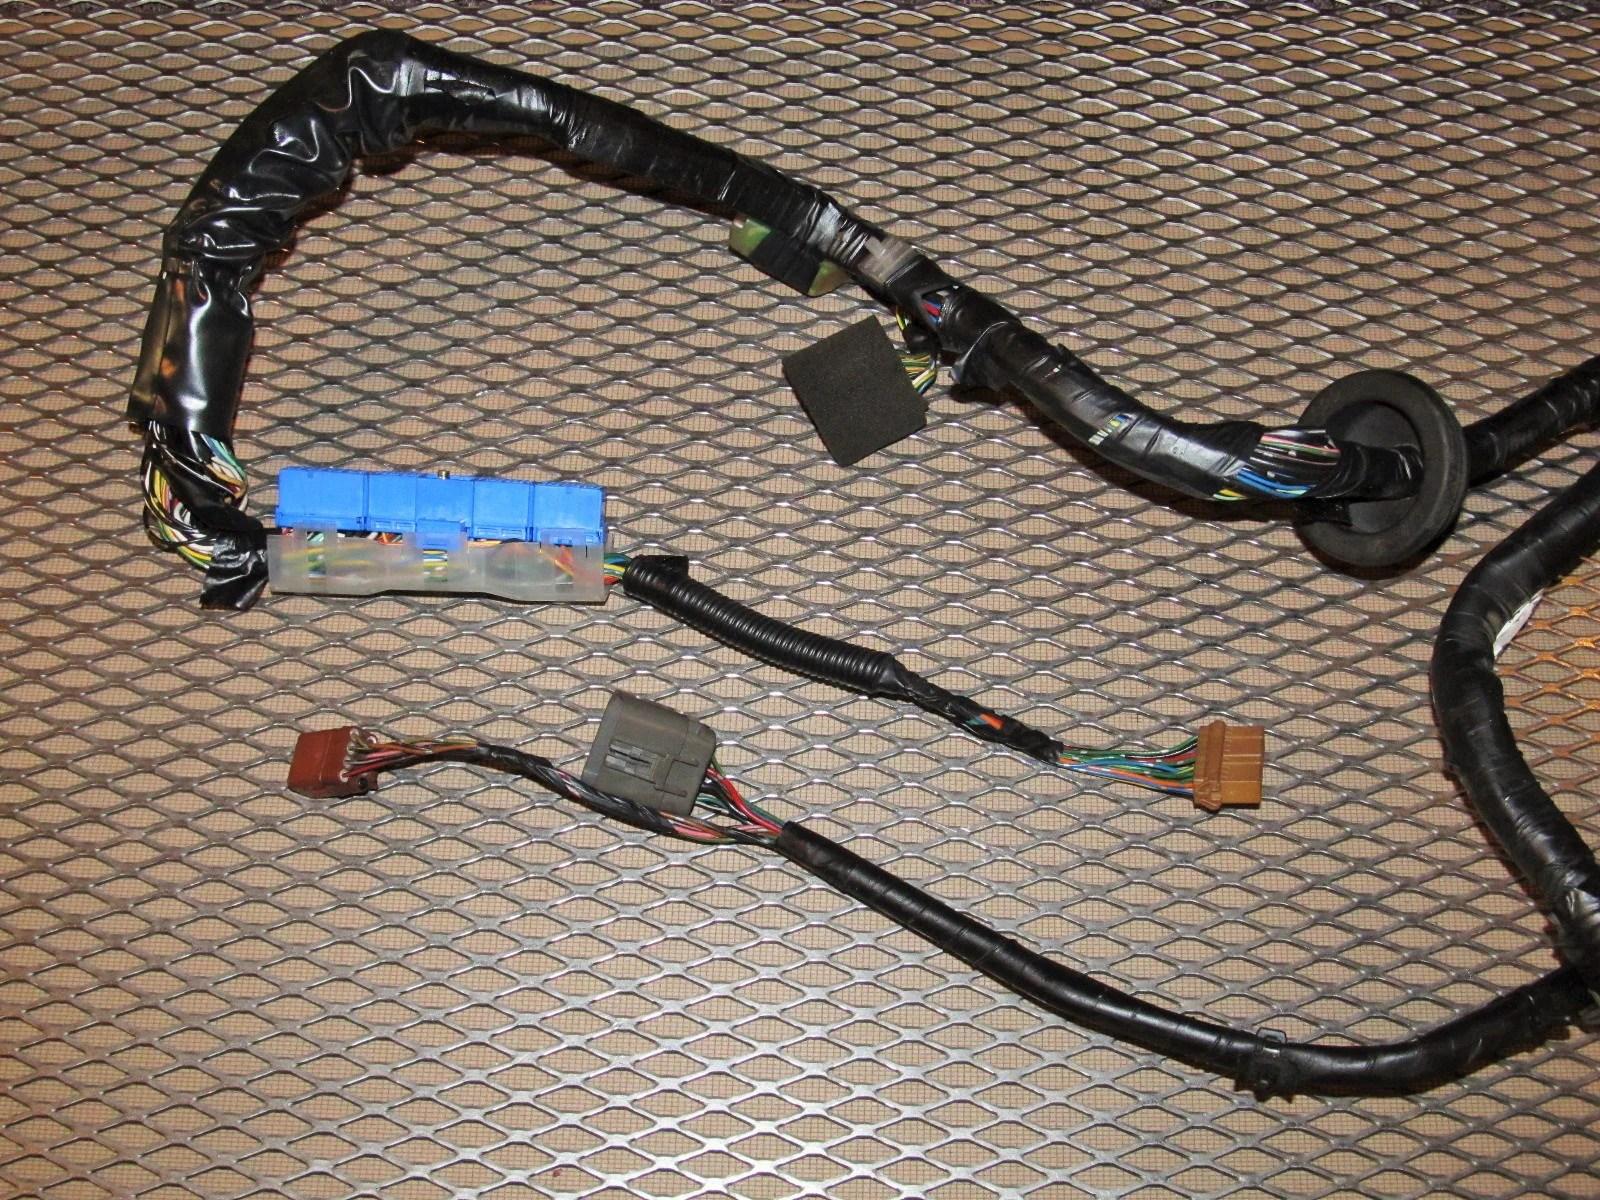 medium resolution of  91 92 93 94 nissan 240sx oem engine wiring harness ka24de a t